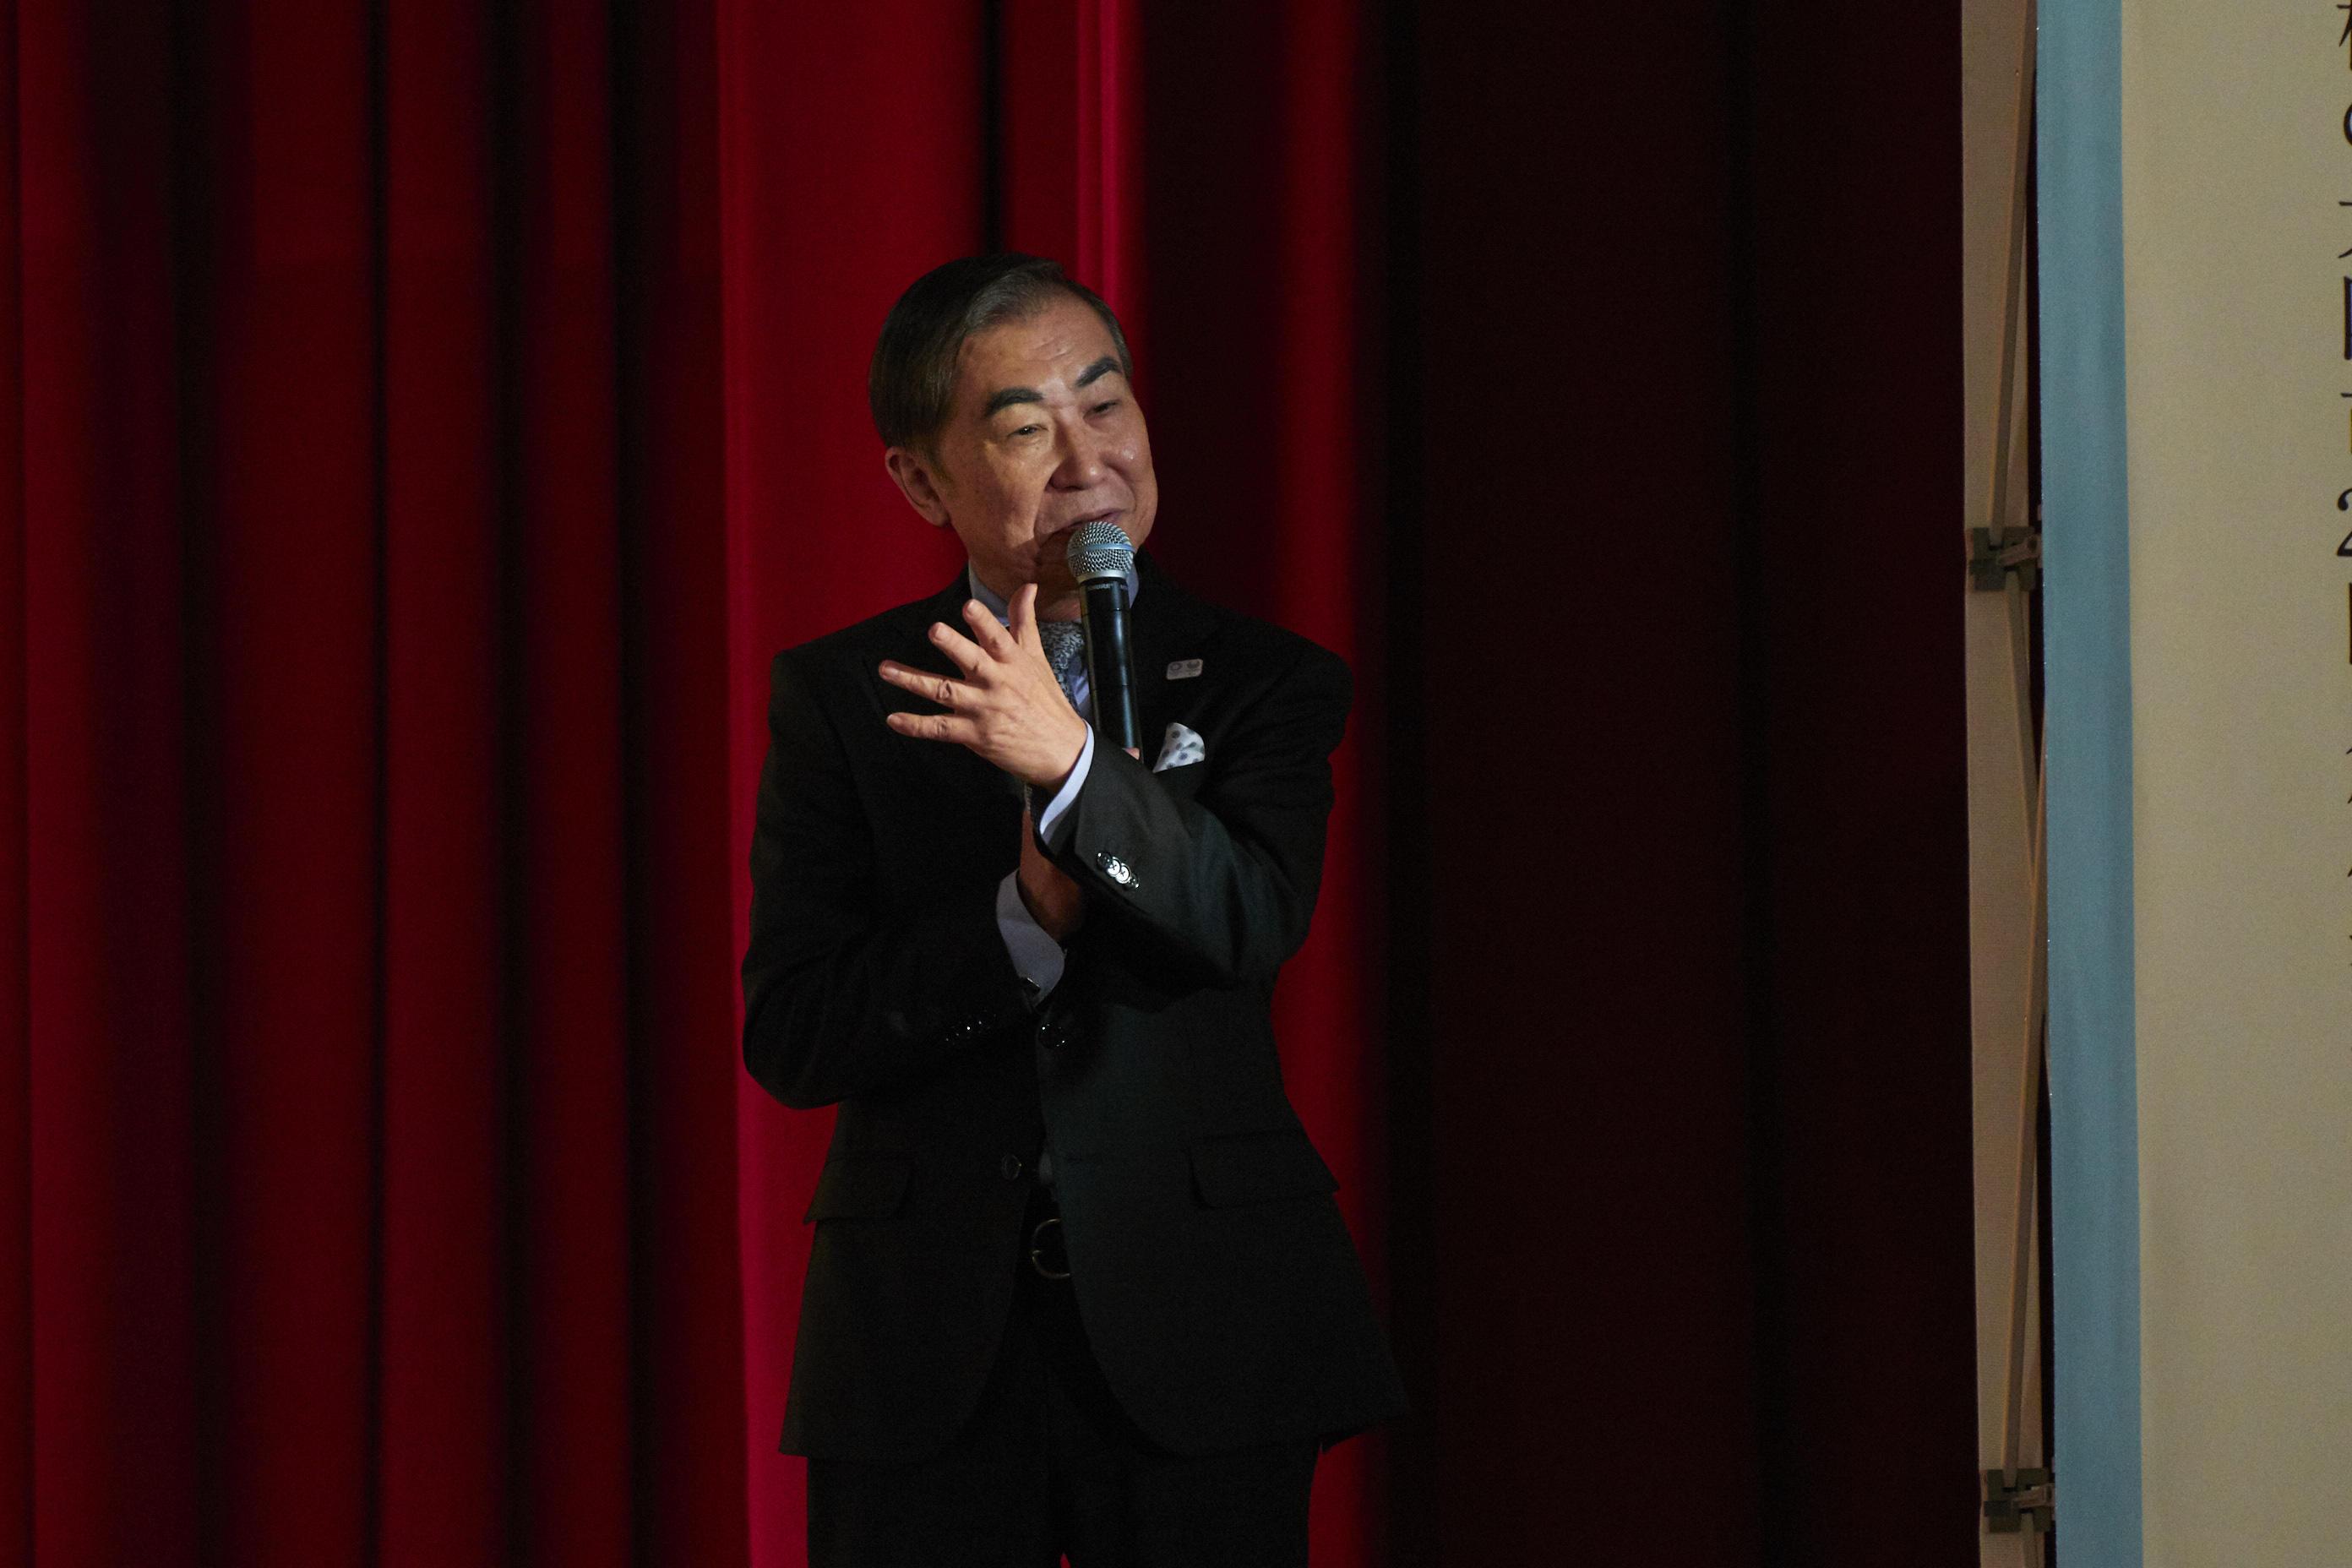 http://news.yoshimoto.co.jp/20180522022356-c7dde6eca47e3e3772bffc8bb624a5a61e3ffa5b.jpg